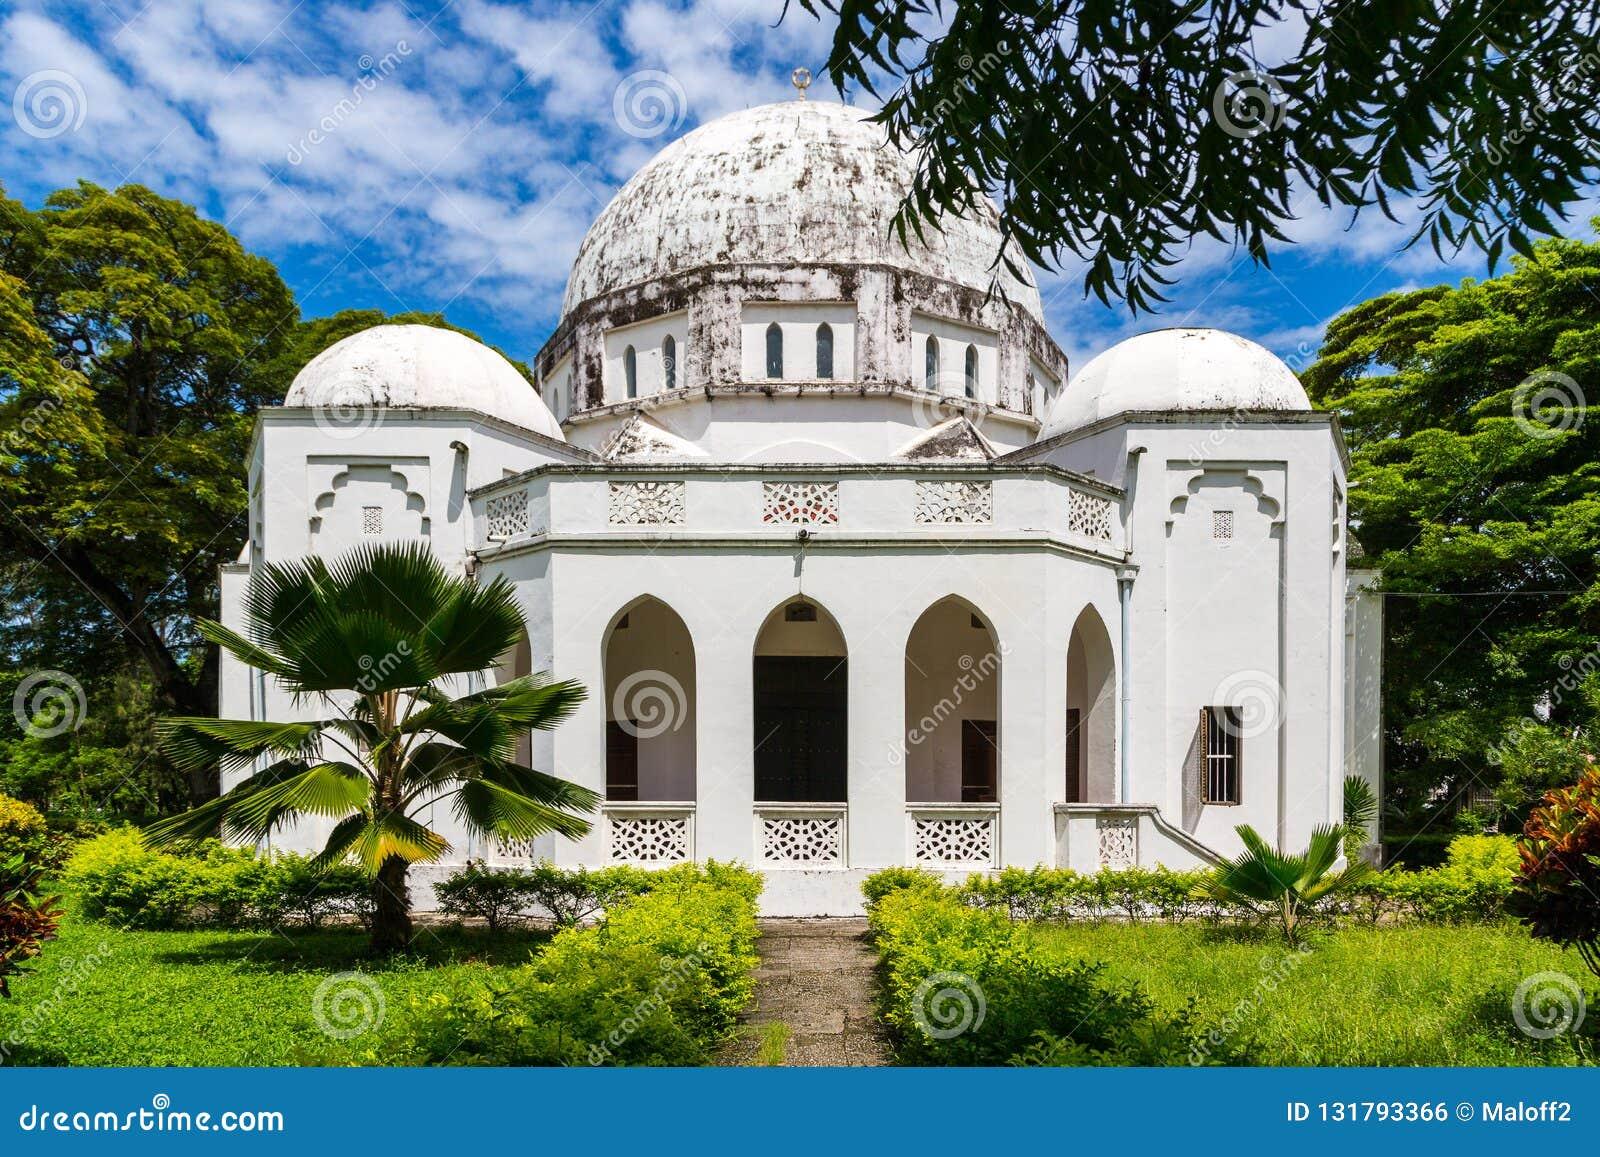 Peace Memorial Museum Beit el Amani. Benjamin Mkapa road, Stone Town, Zanzibar City, Unguja island, Tanzania.